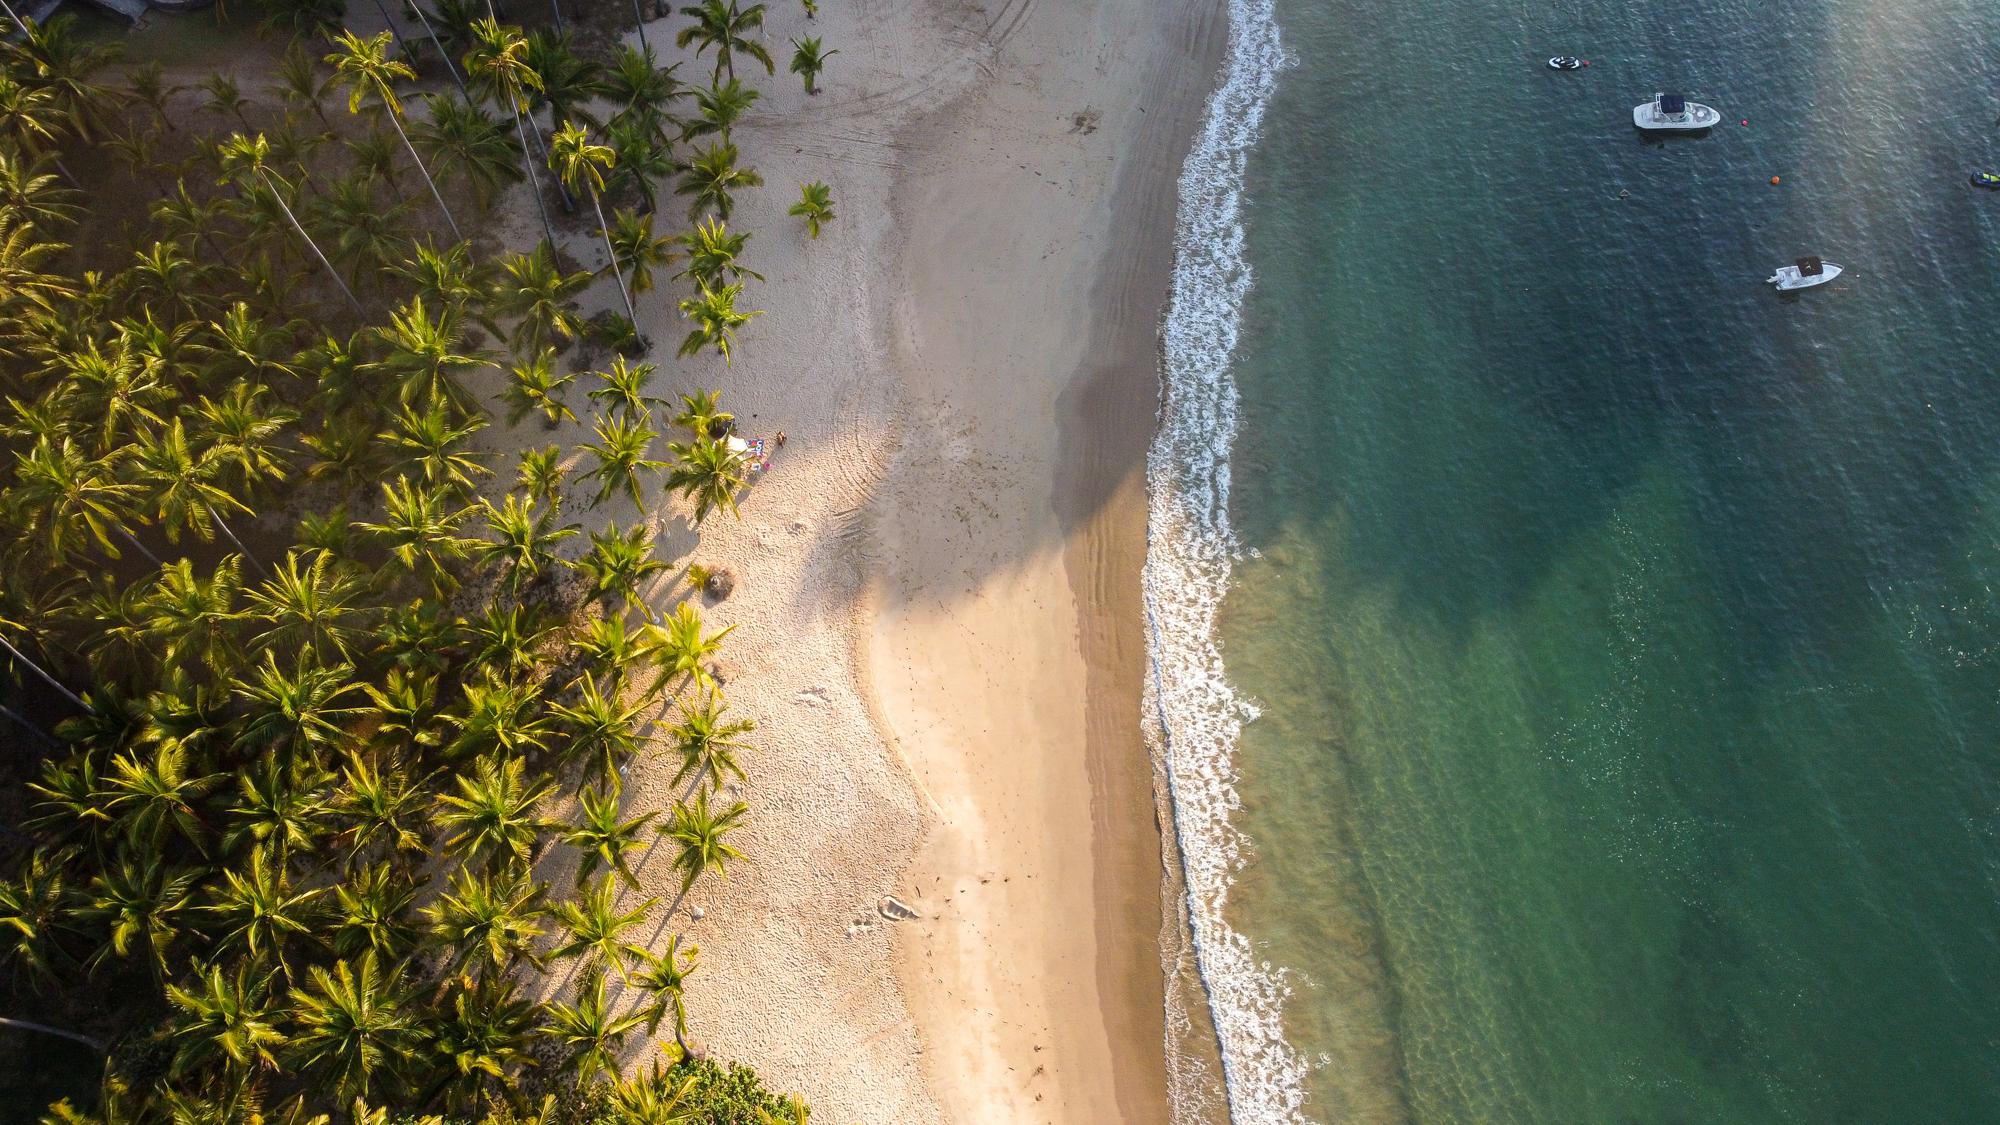 best hidden gems in mexico, chacala marina mexico, surf towns in mexico, best zarandeado in mexico